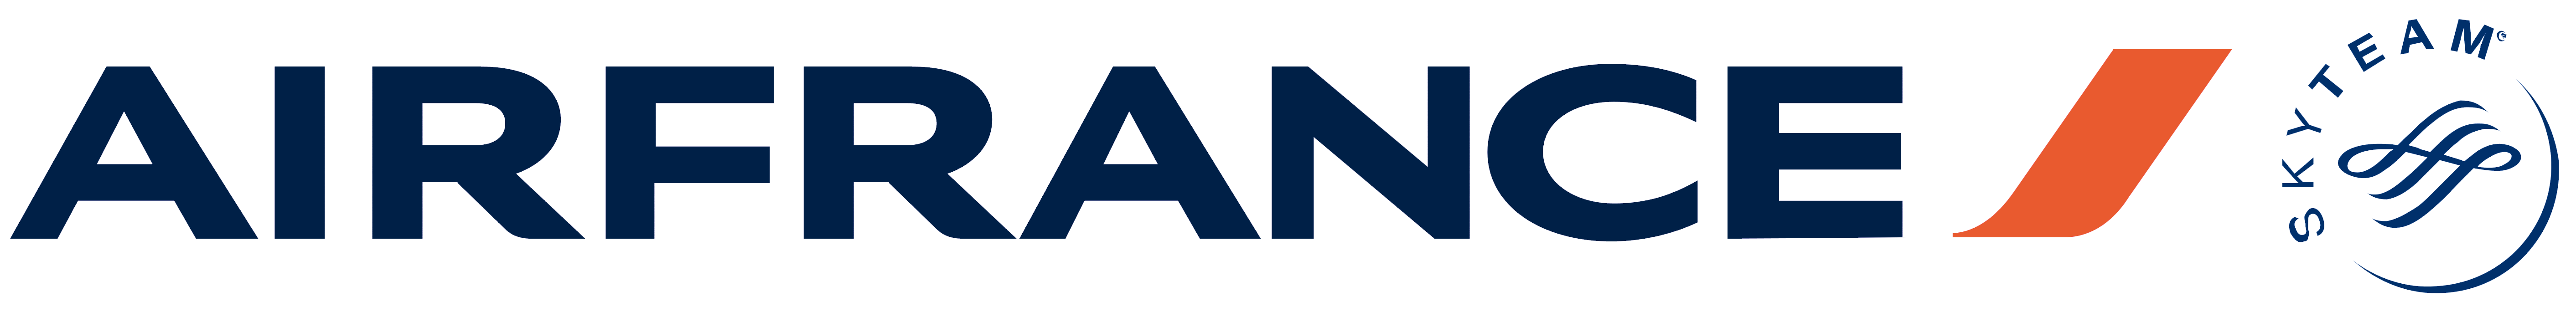 Air France logo (AirFrance, SkyTeam symbol) - Air France Logo PNG